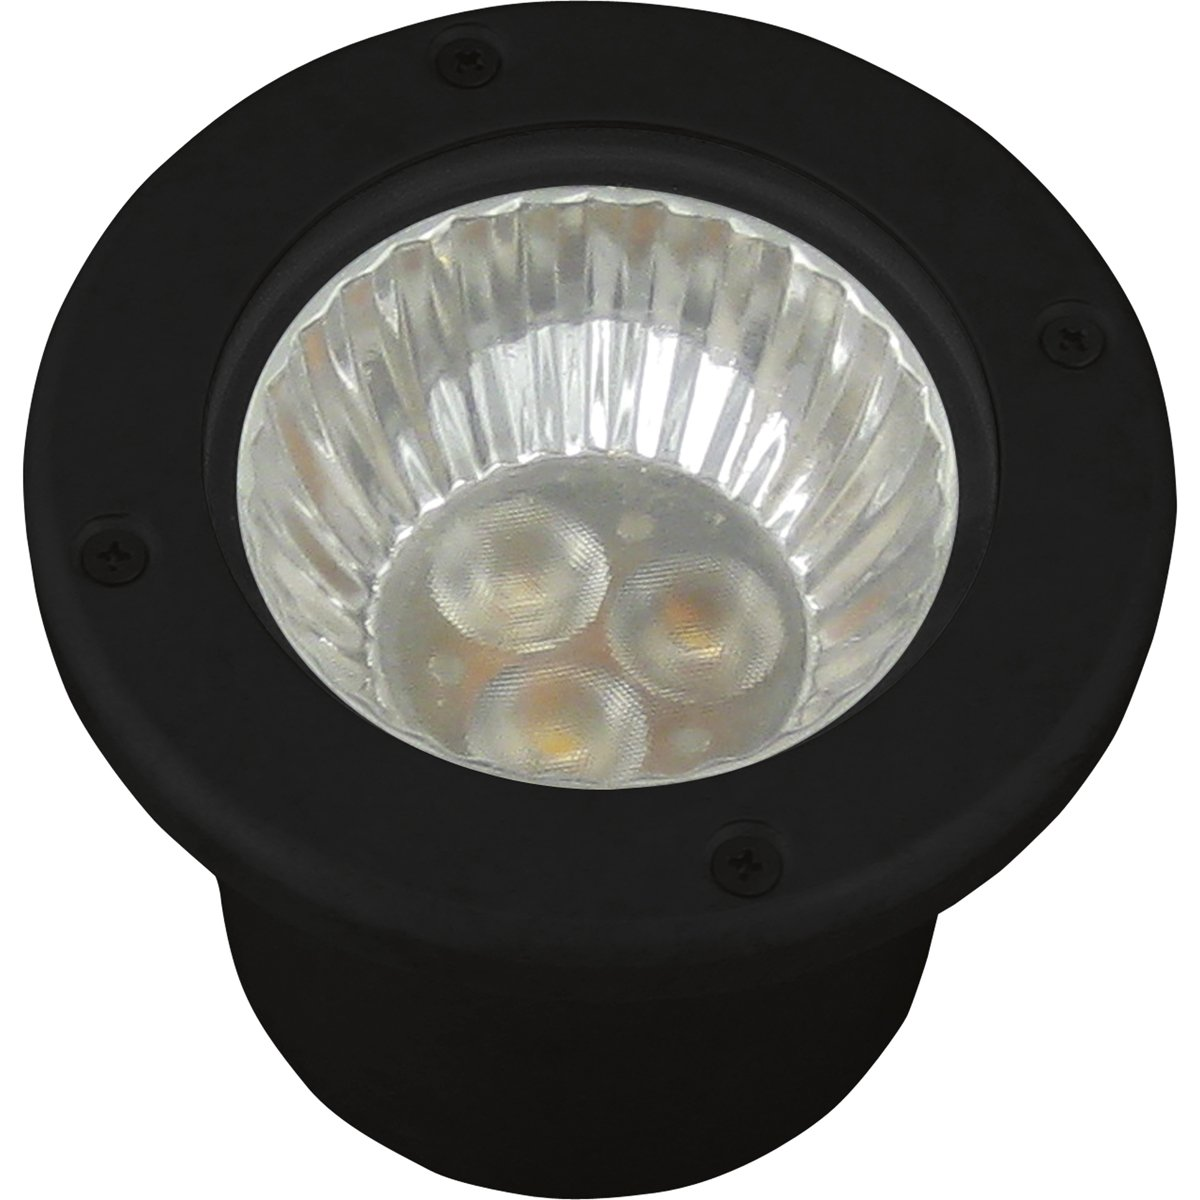 Progress Lighting P5295-31 LED Well Light, Black Finish by Progress Lighting